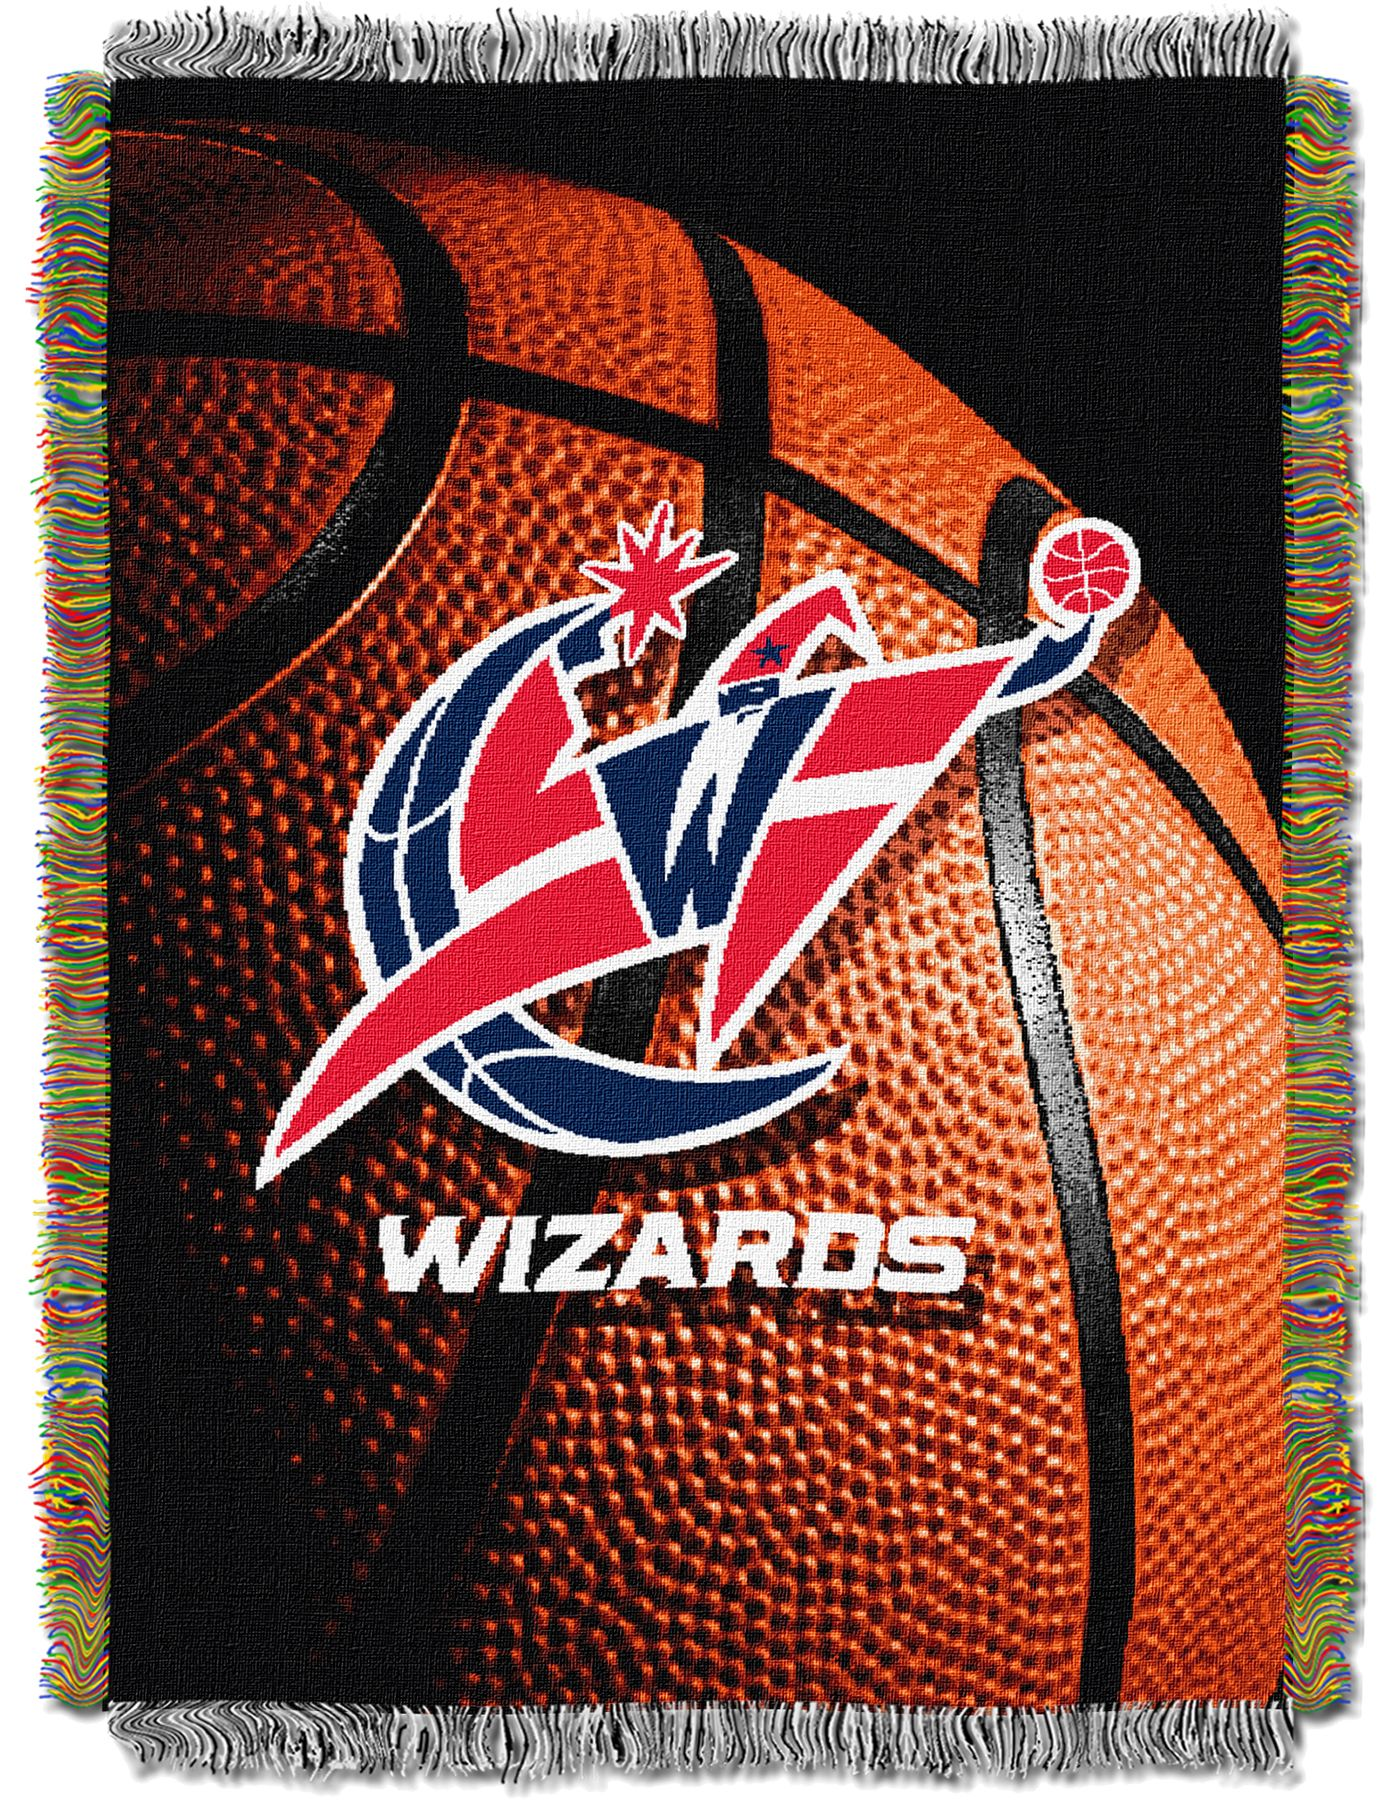 Northwest Washington Wizards Photo Real Throw Blanket